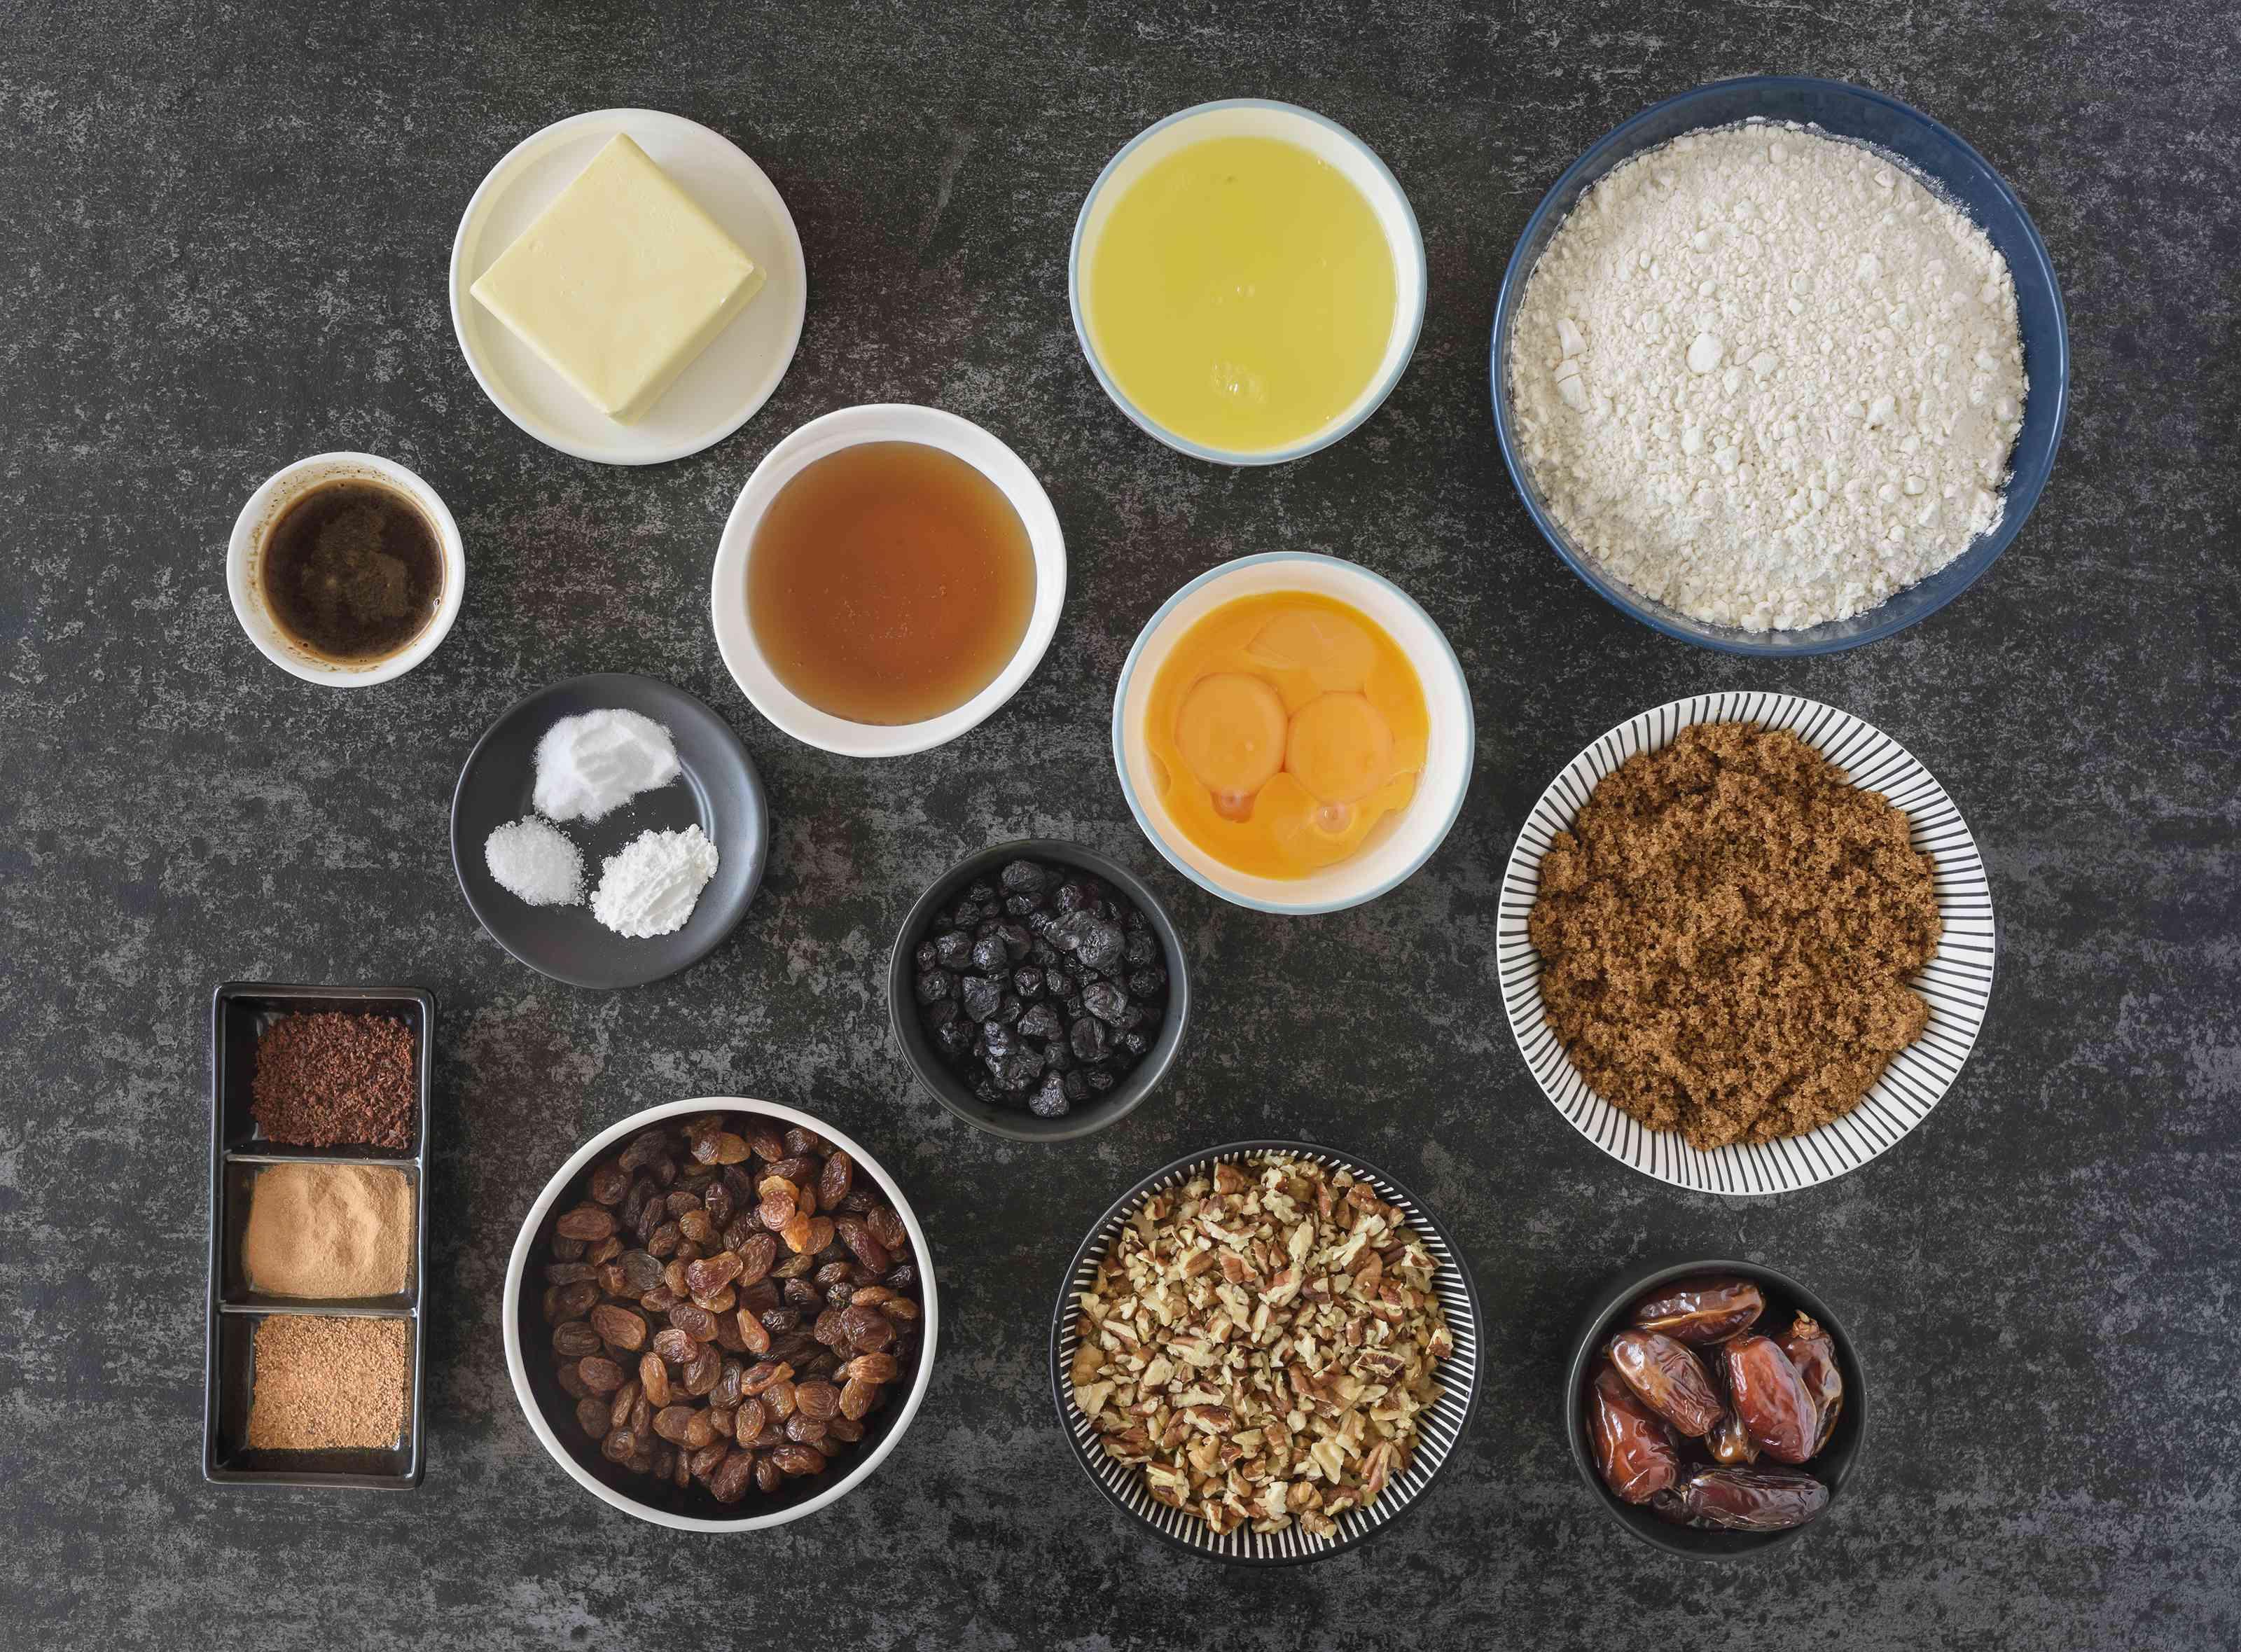 Ingredients for Ukrainian Christmas honey cake